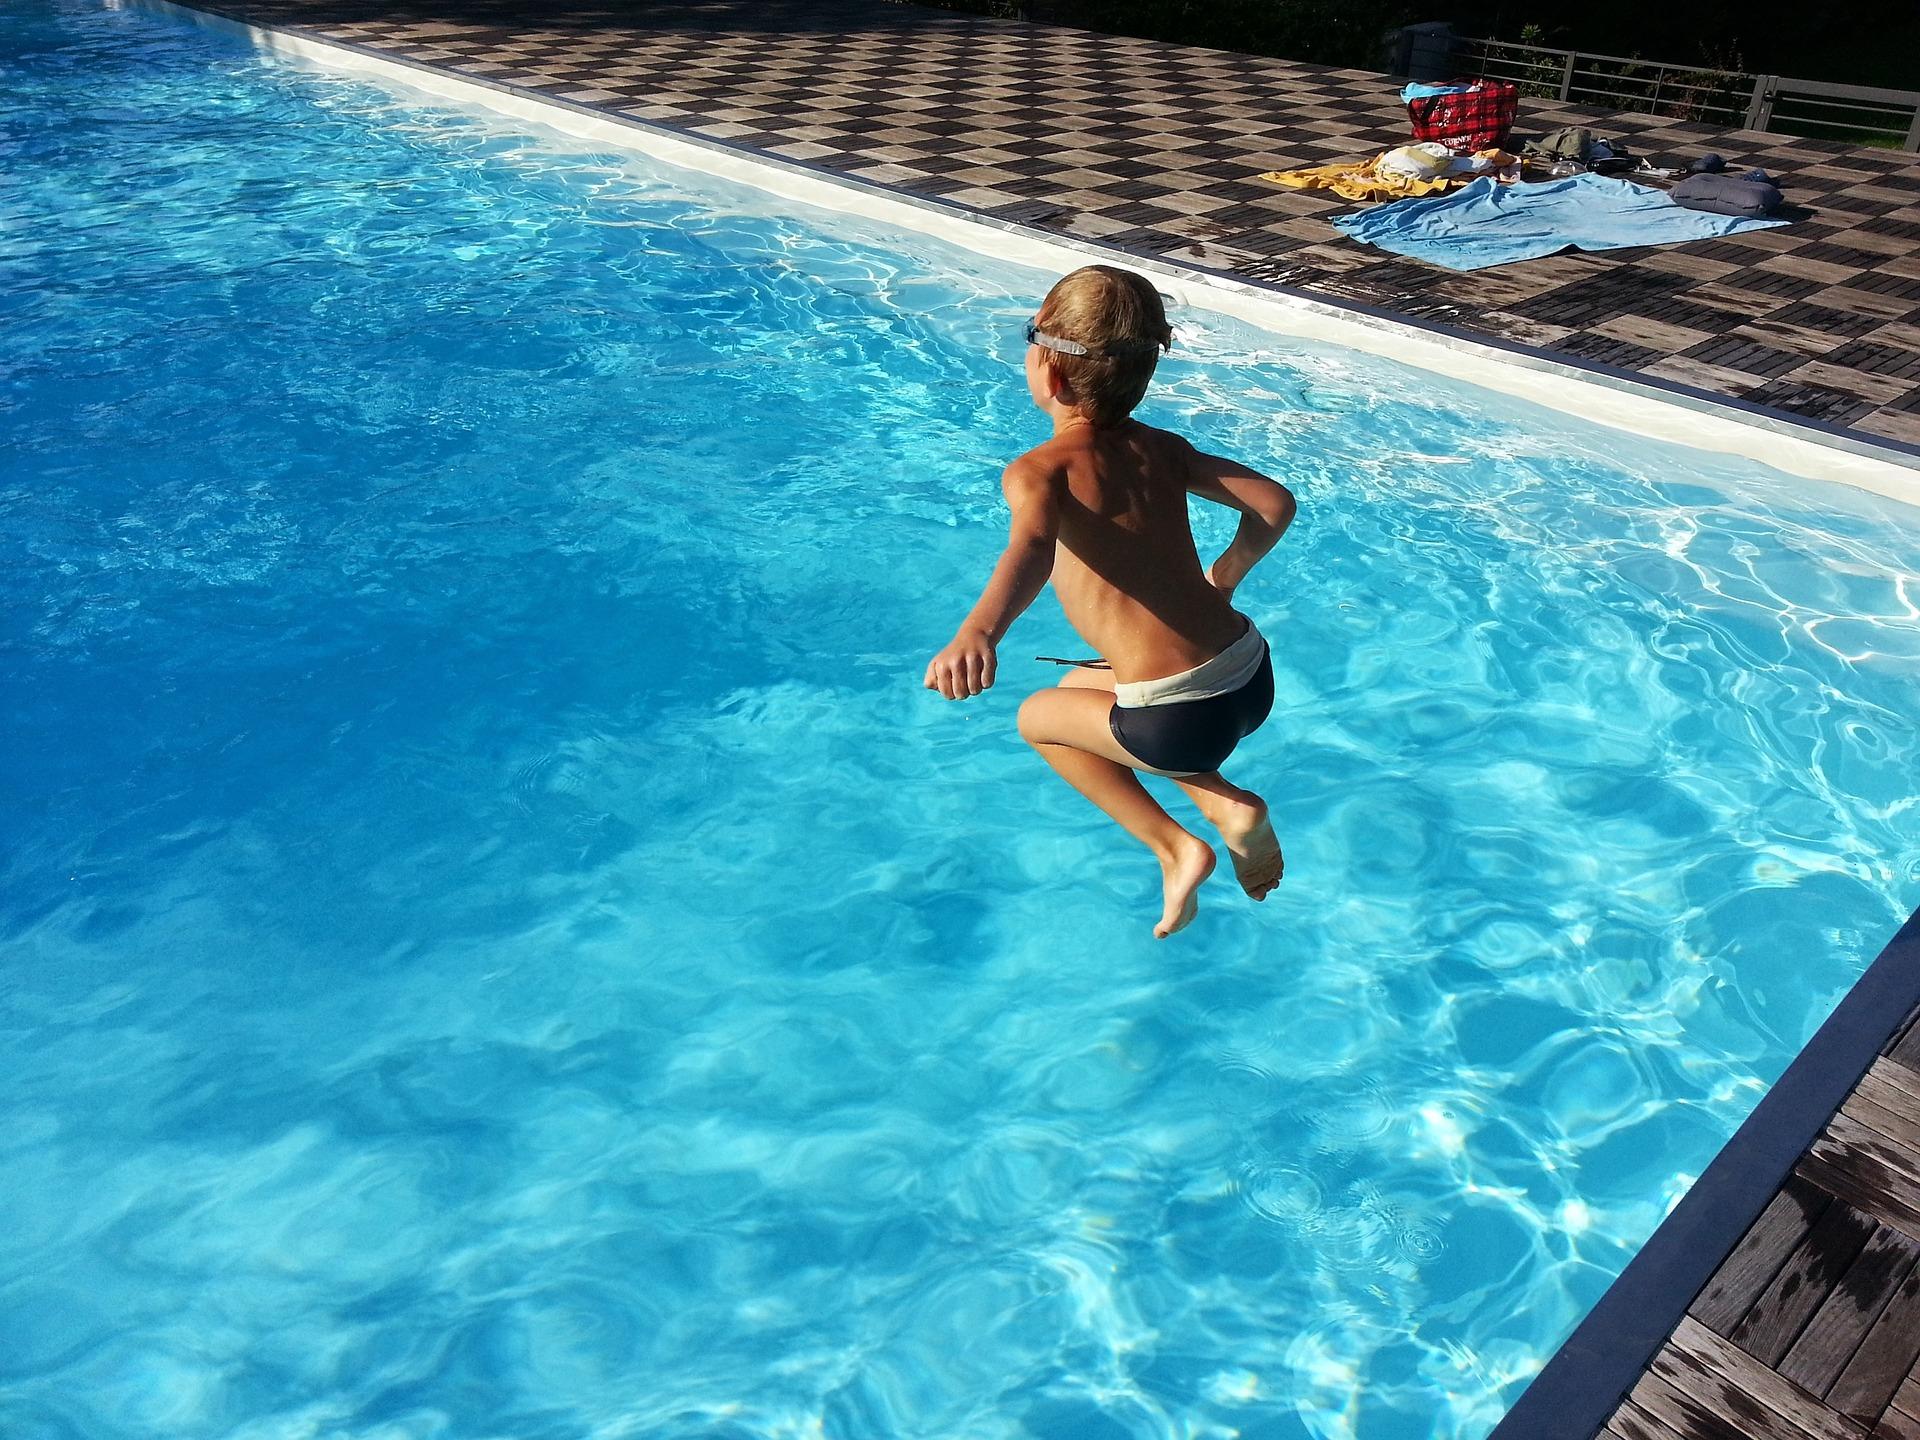 It´s pool time with jujuju aquacenter benissa calpe javea moraira altea denia benidorm